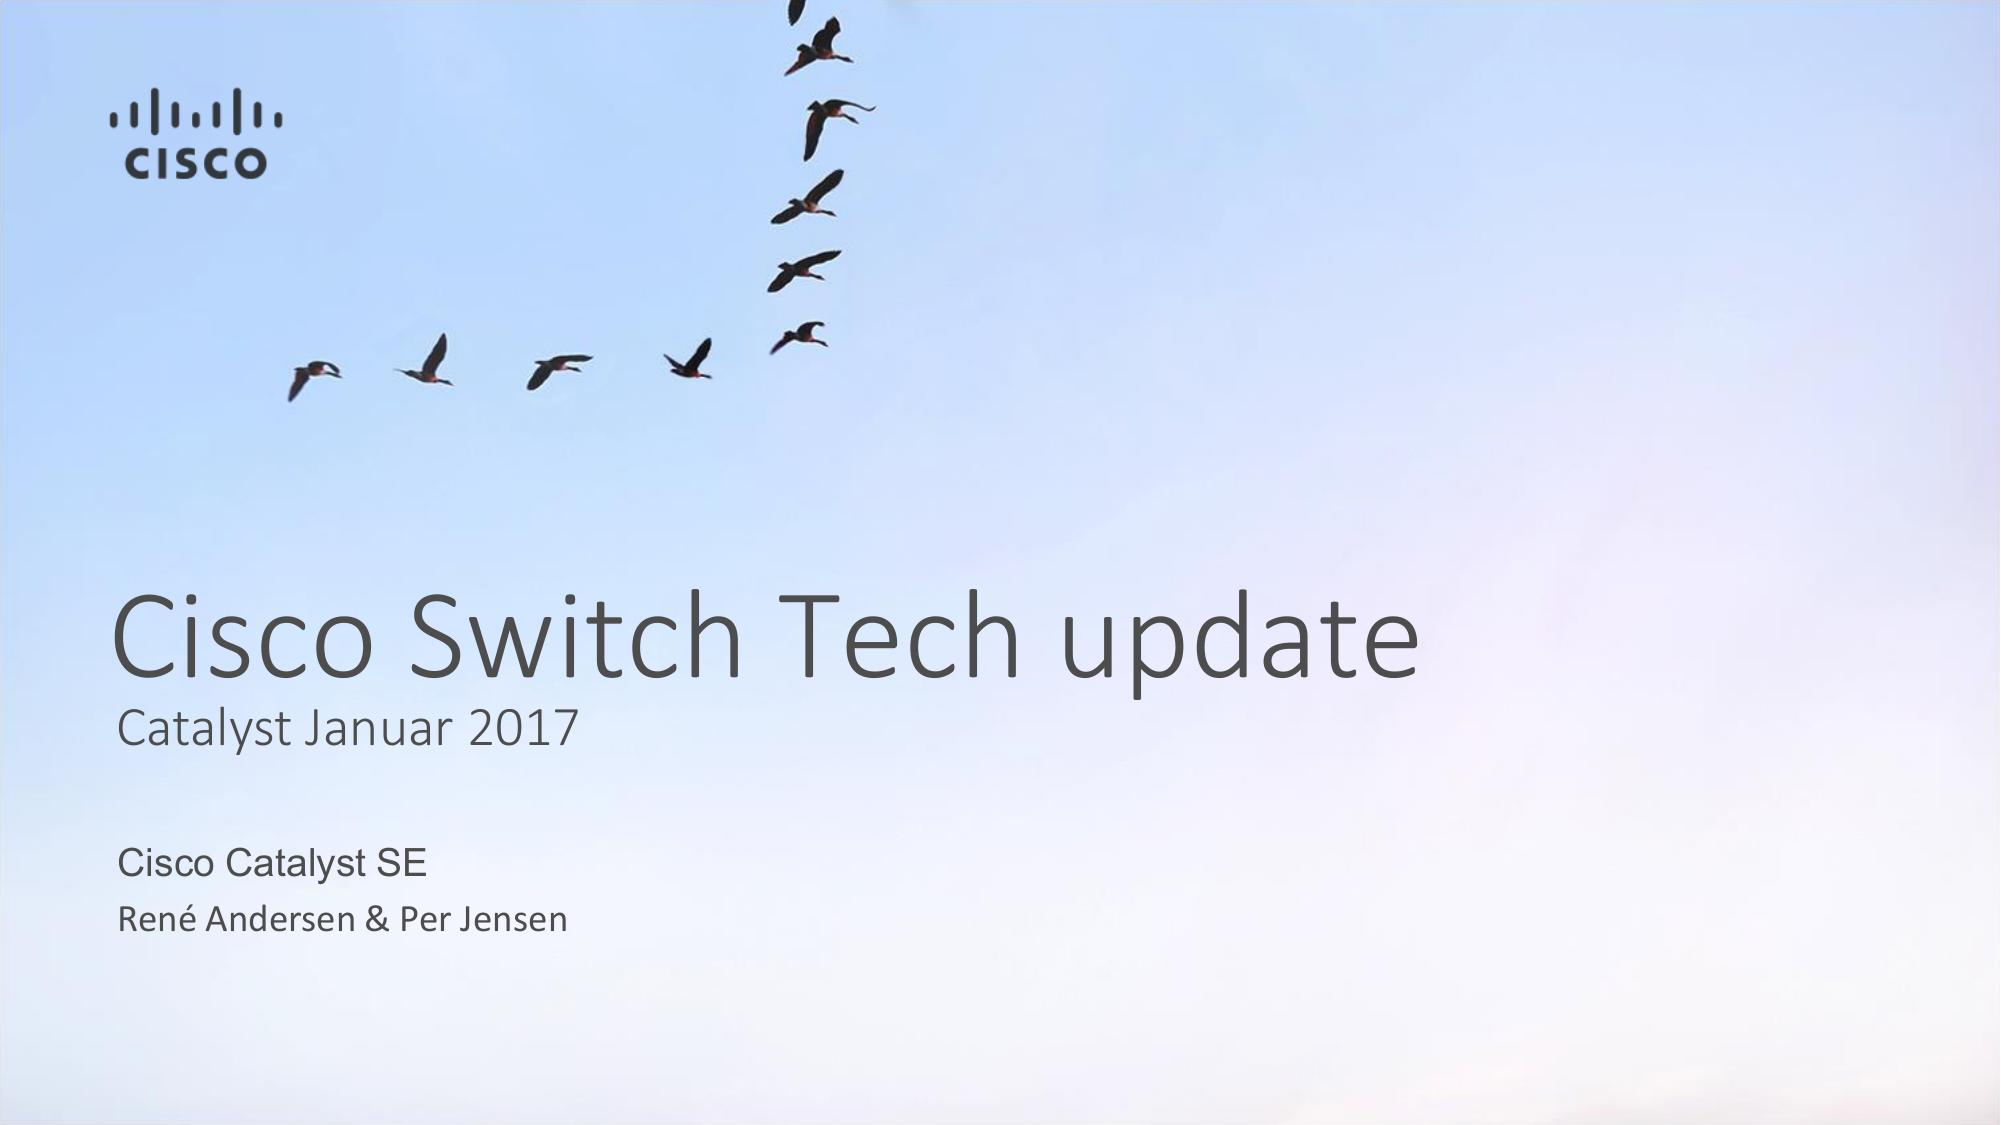 Cisco Switch Tech update | manualzz com